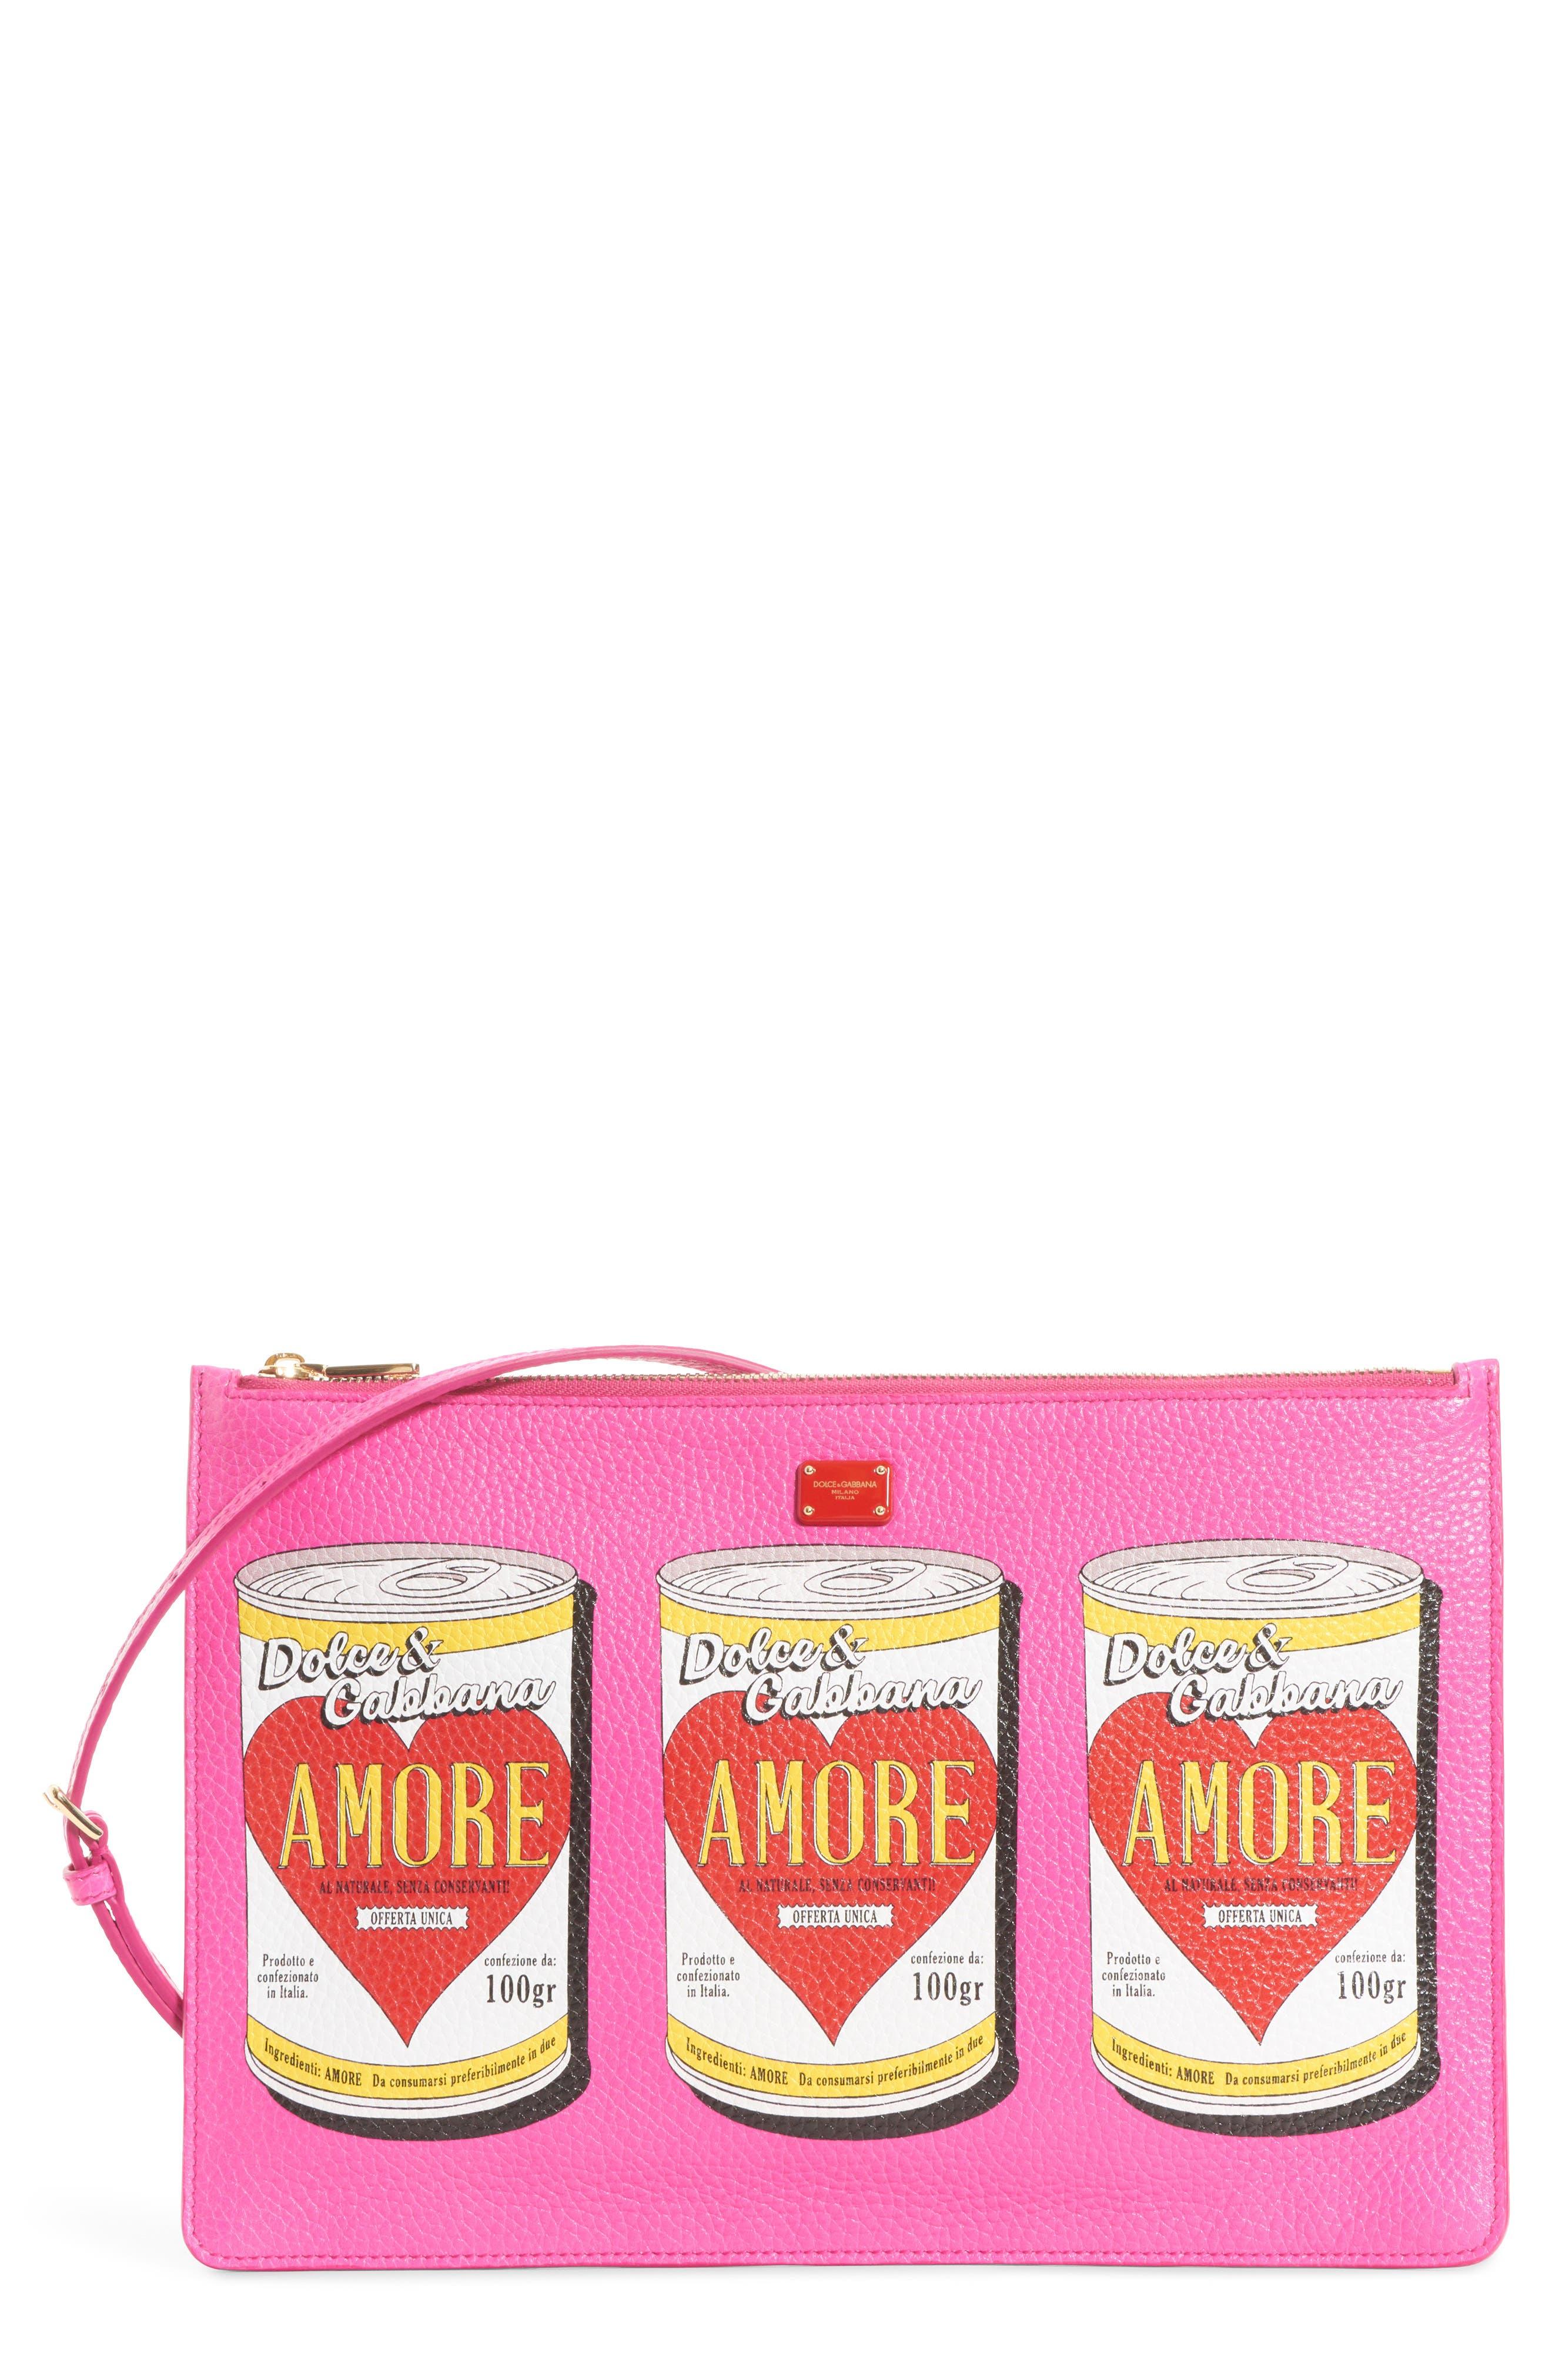 Dolce&Gabbana Cleo Soup Can Print Leather Shoulder Bag